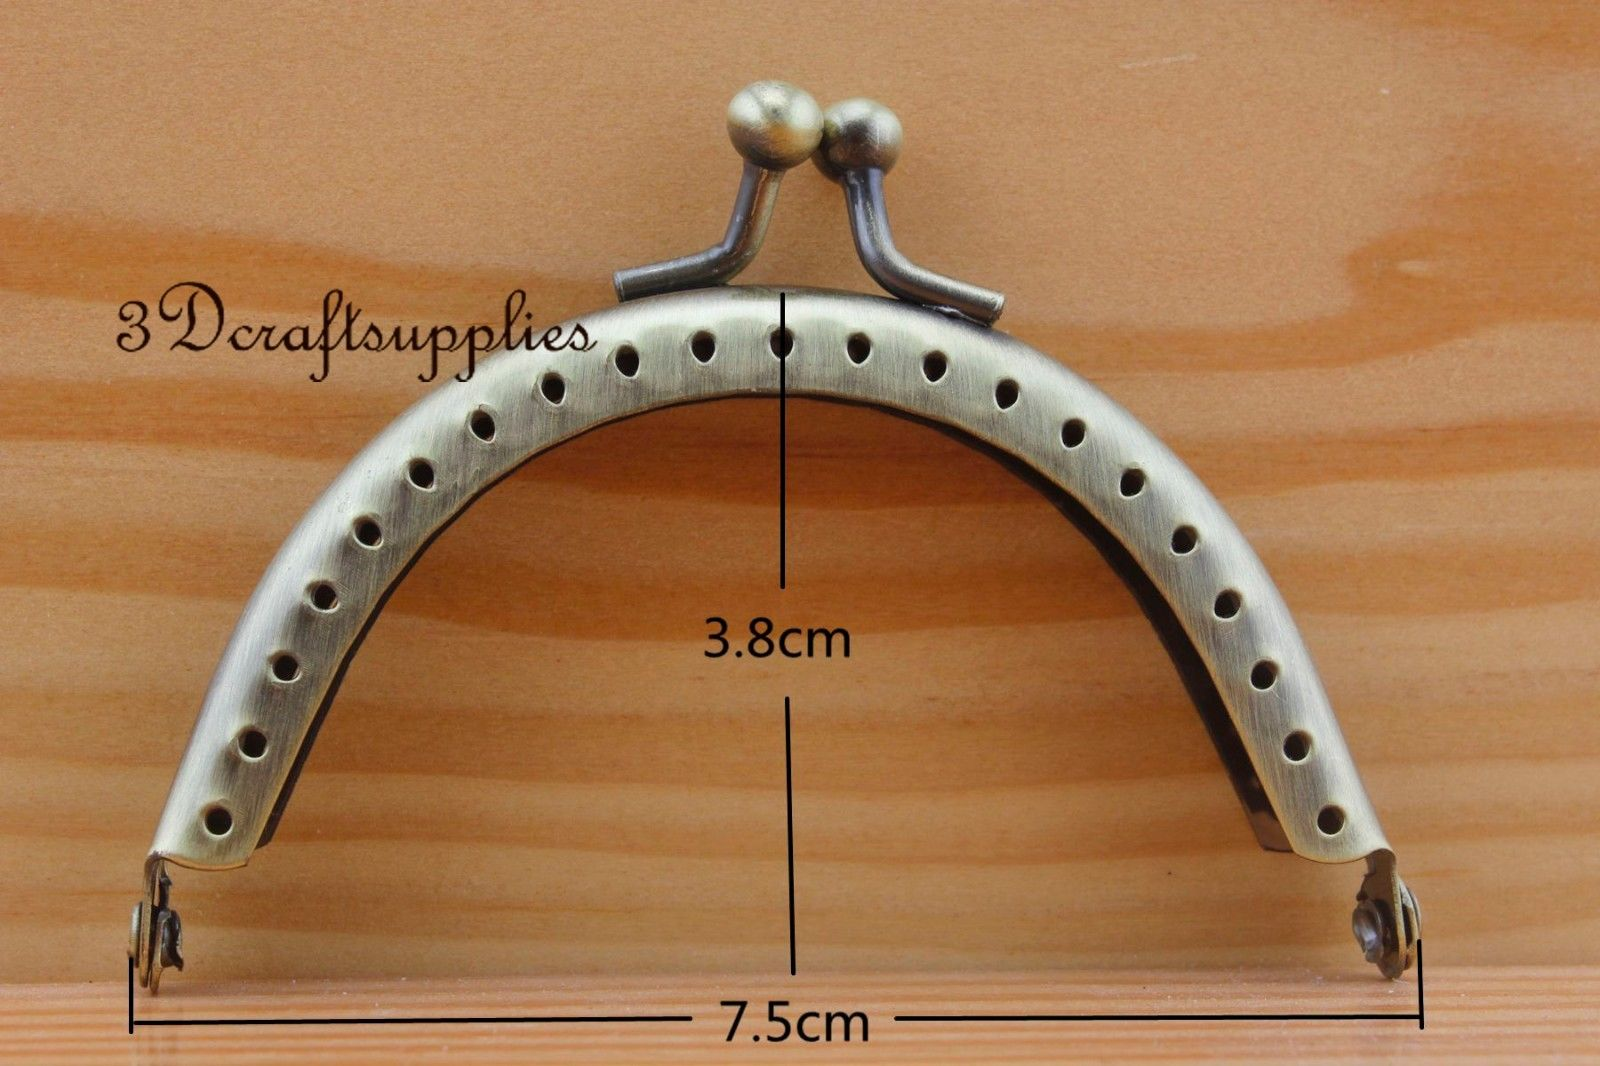 sewing bag purse frame metal frame 3 inch x 1 1/2 inch Anti bronze A46